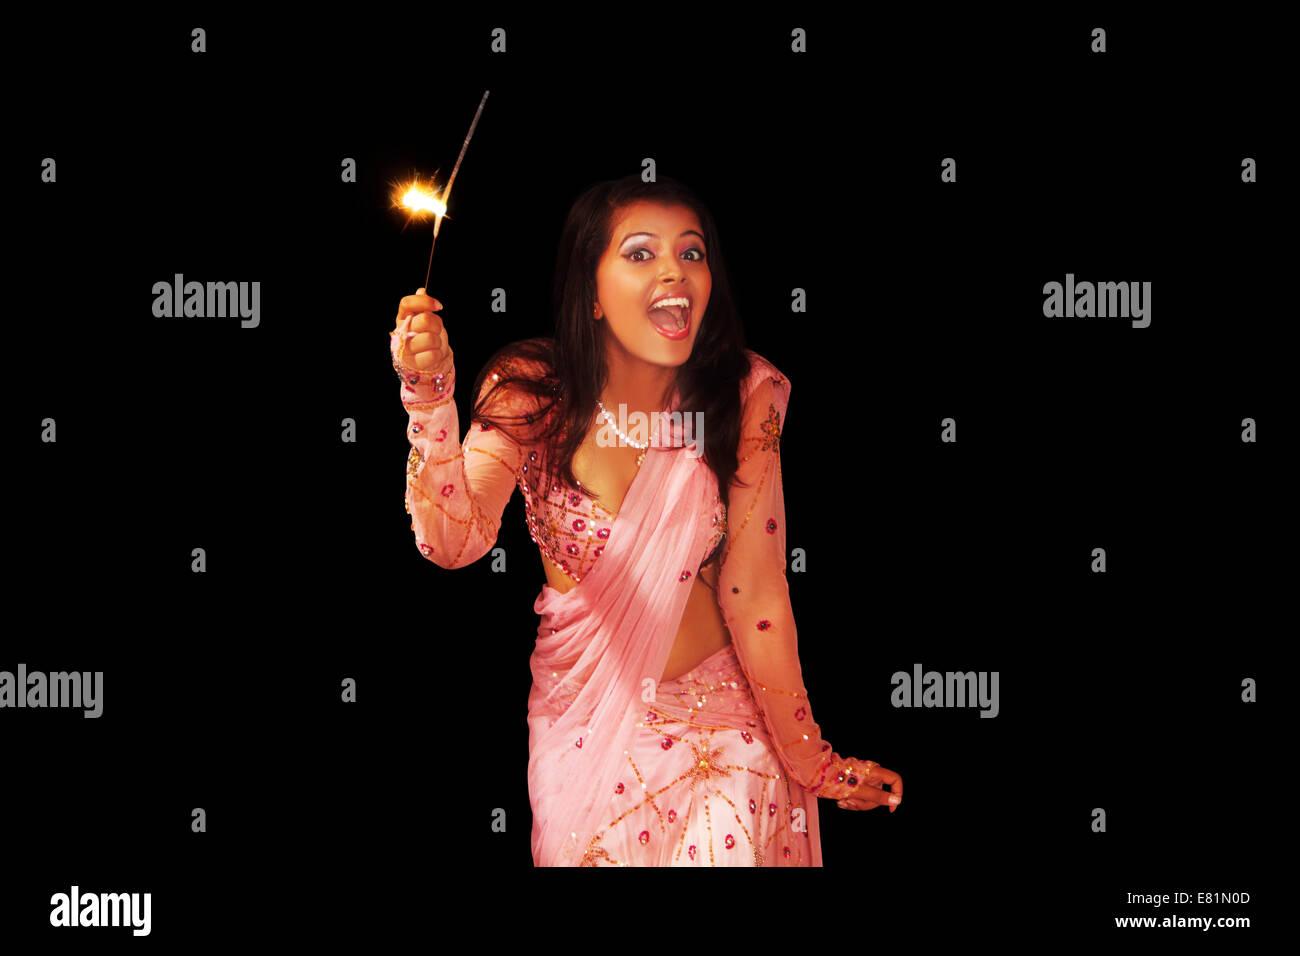 indian Ladies diwali Festival Fire Cracker Stock Photo